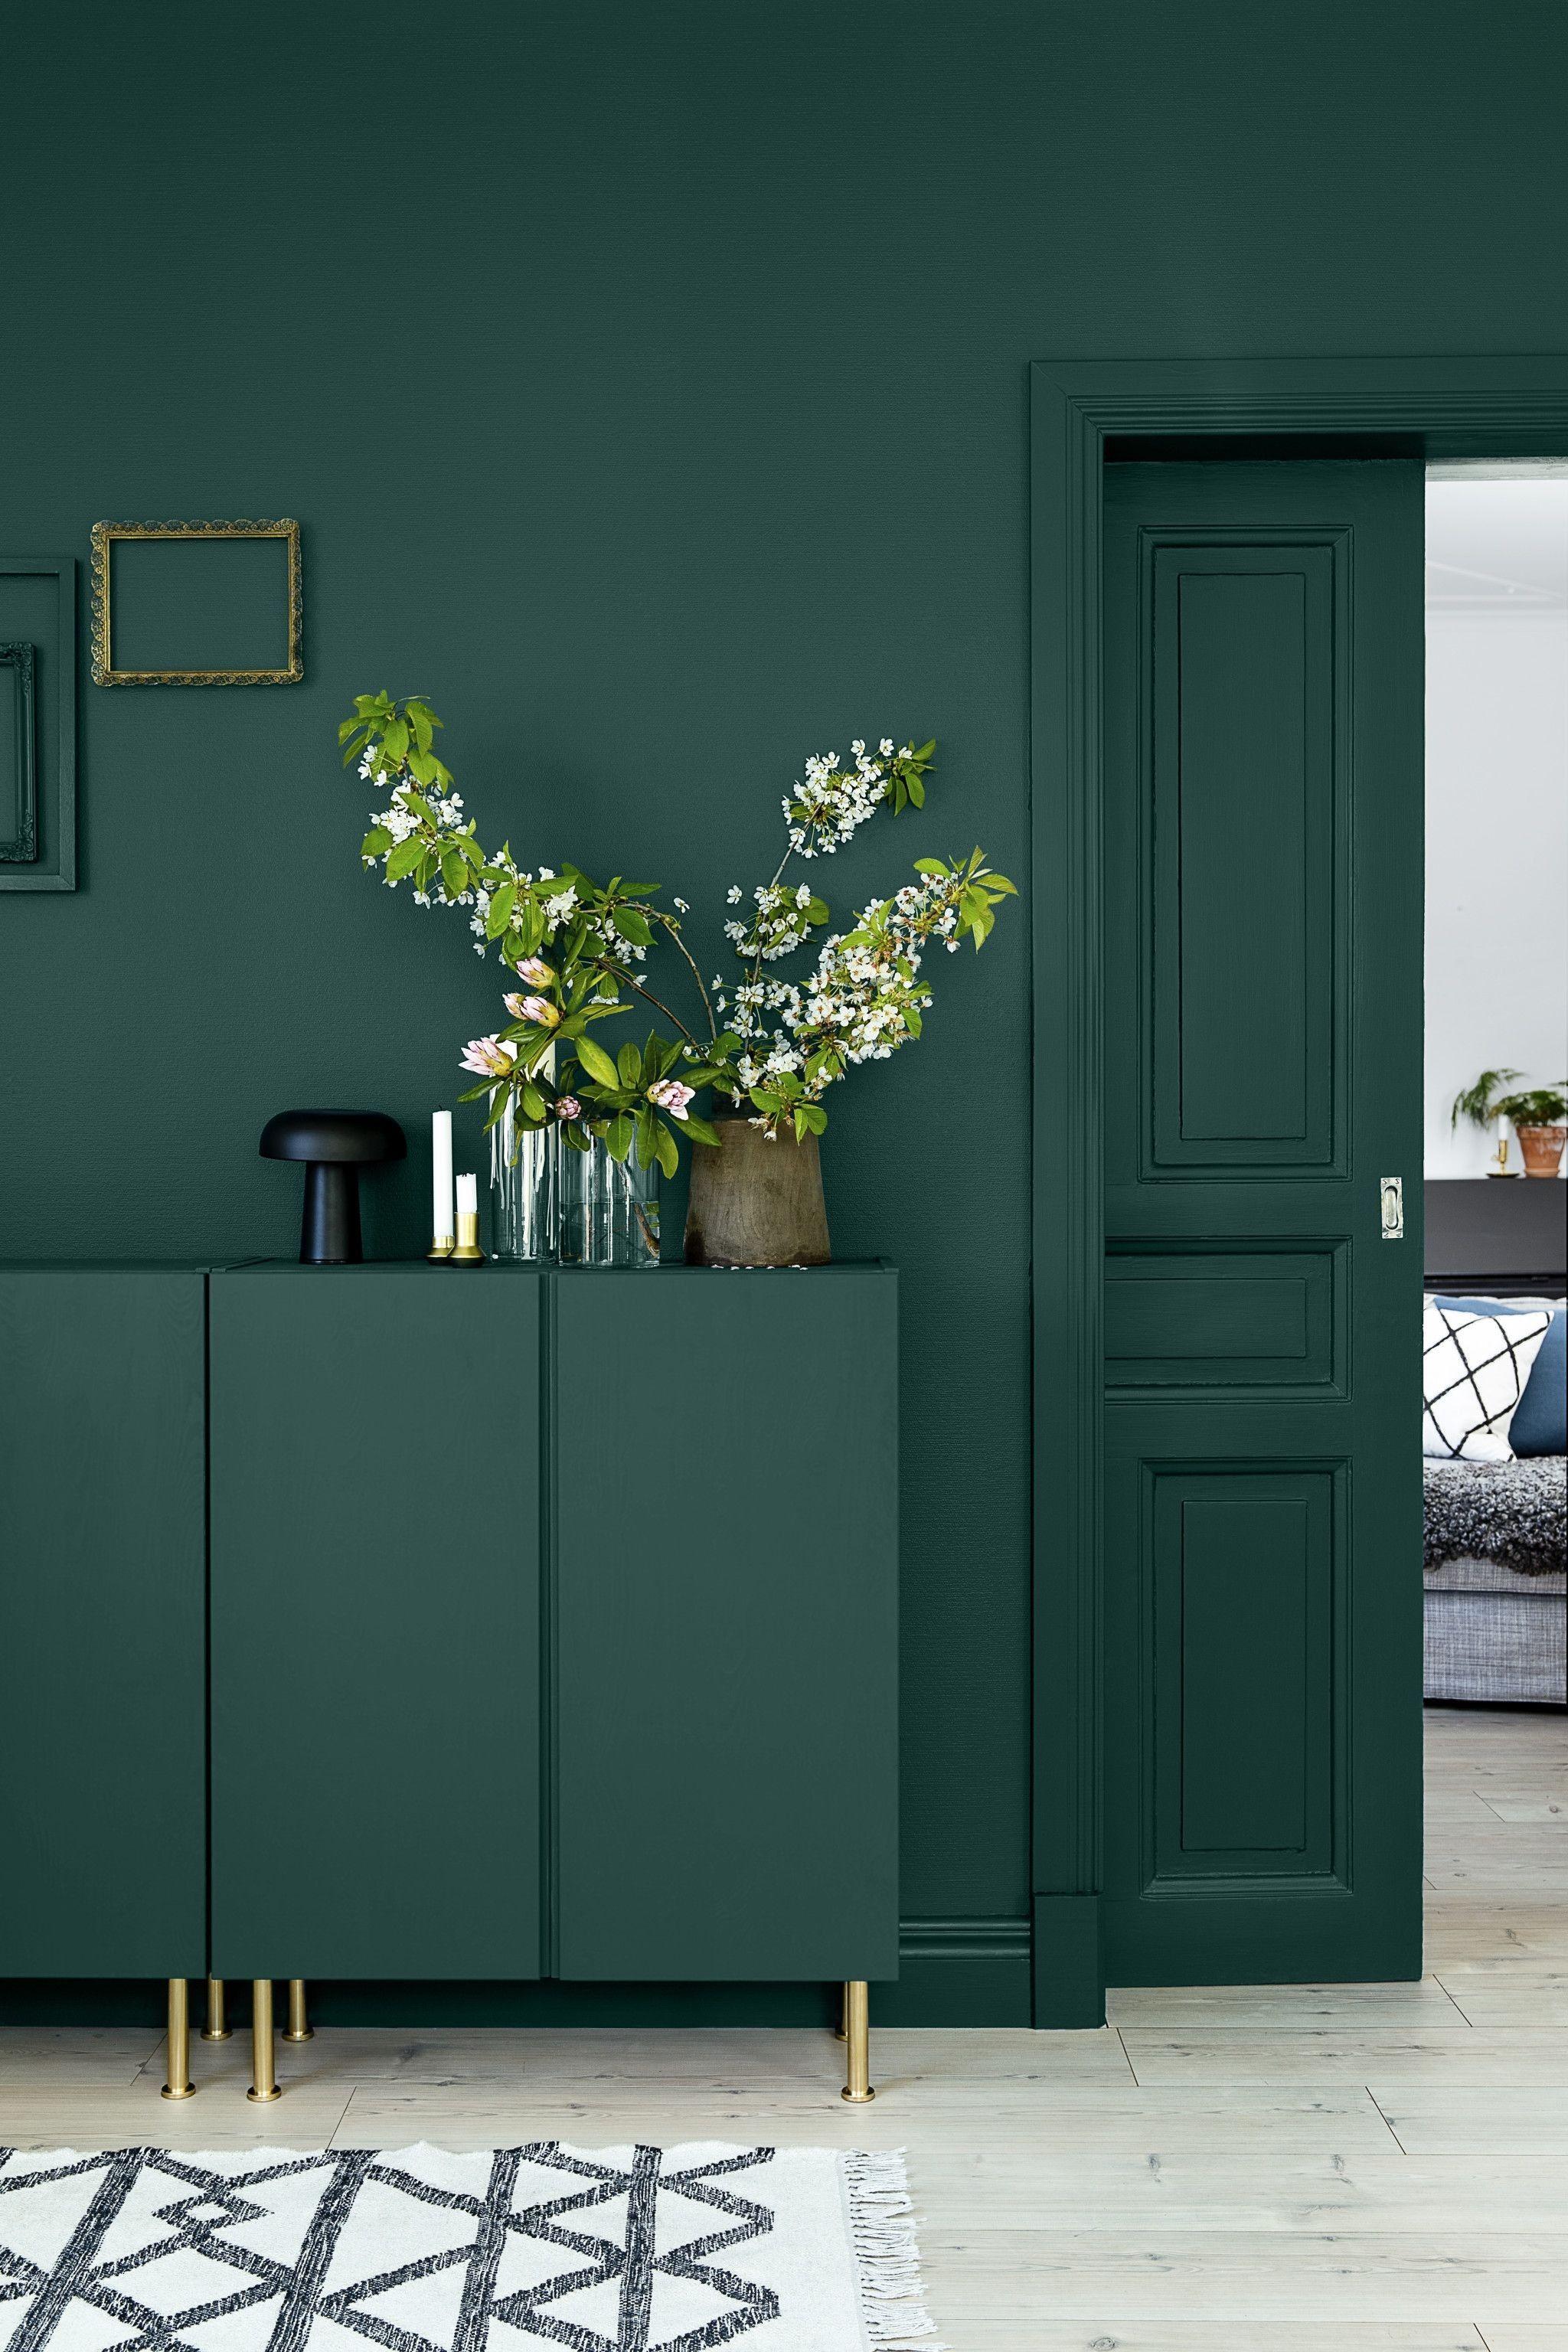 top 10 interior paint colors trending for 2019 dream home green rh pinterest com